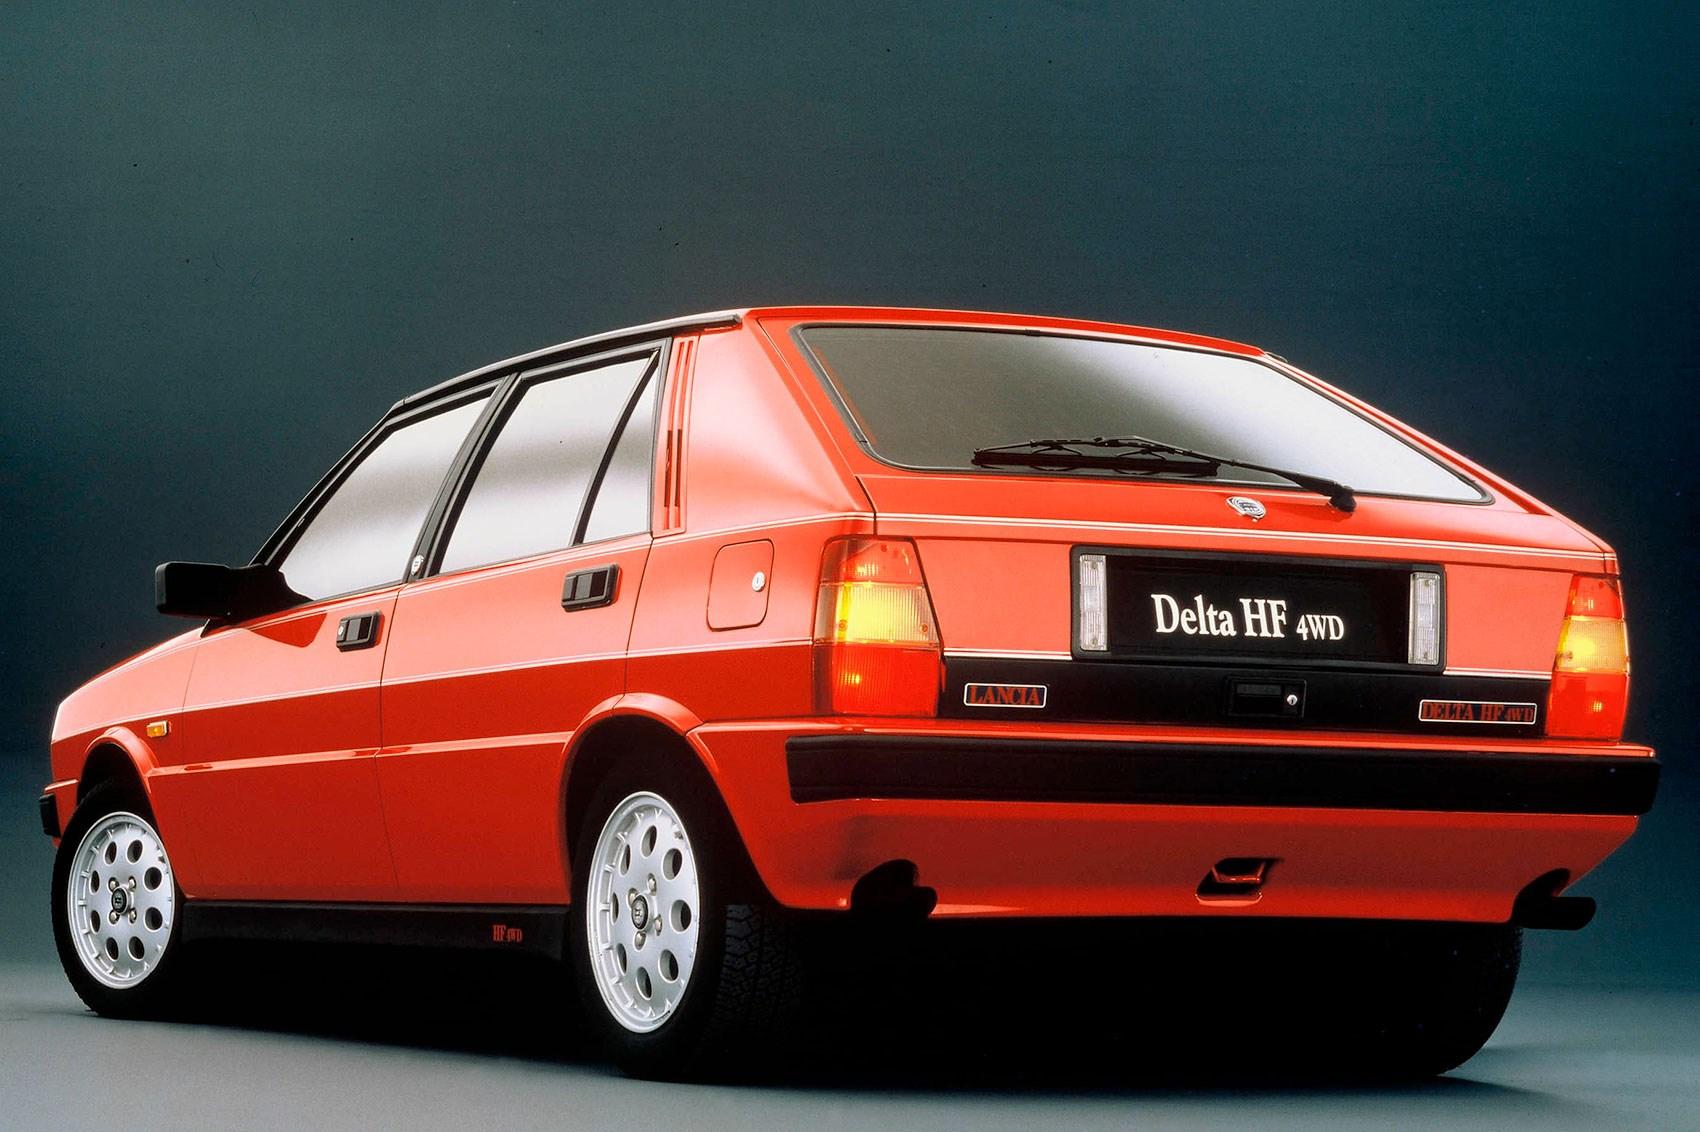 lancia delta hf 4wd vs audi quattro car archive 1986 by car magazine. Black Bedroom Furniture Sets. Home Design Ideas